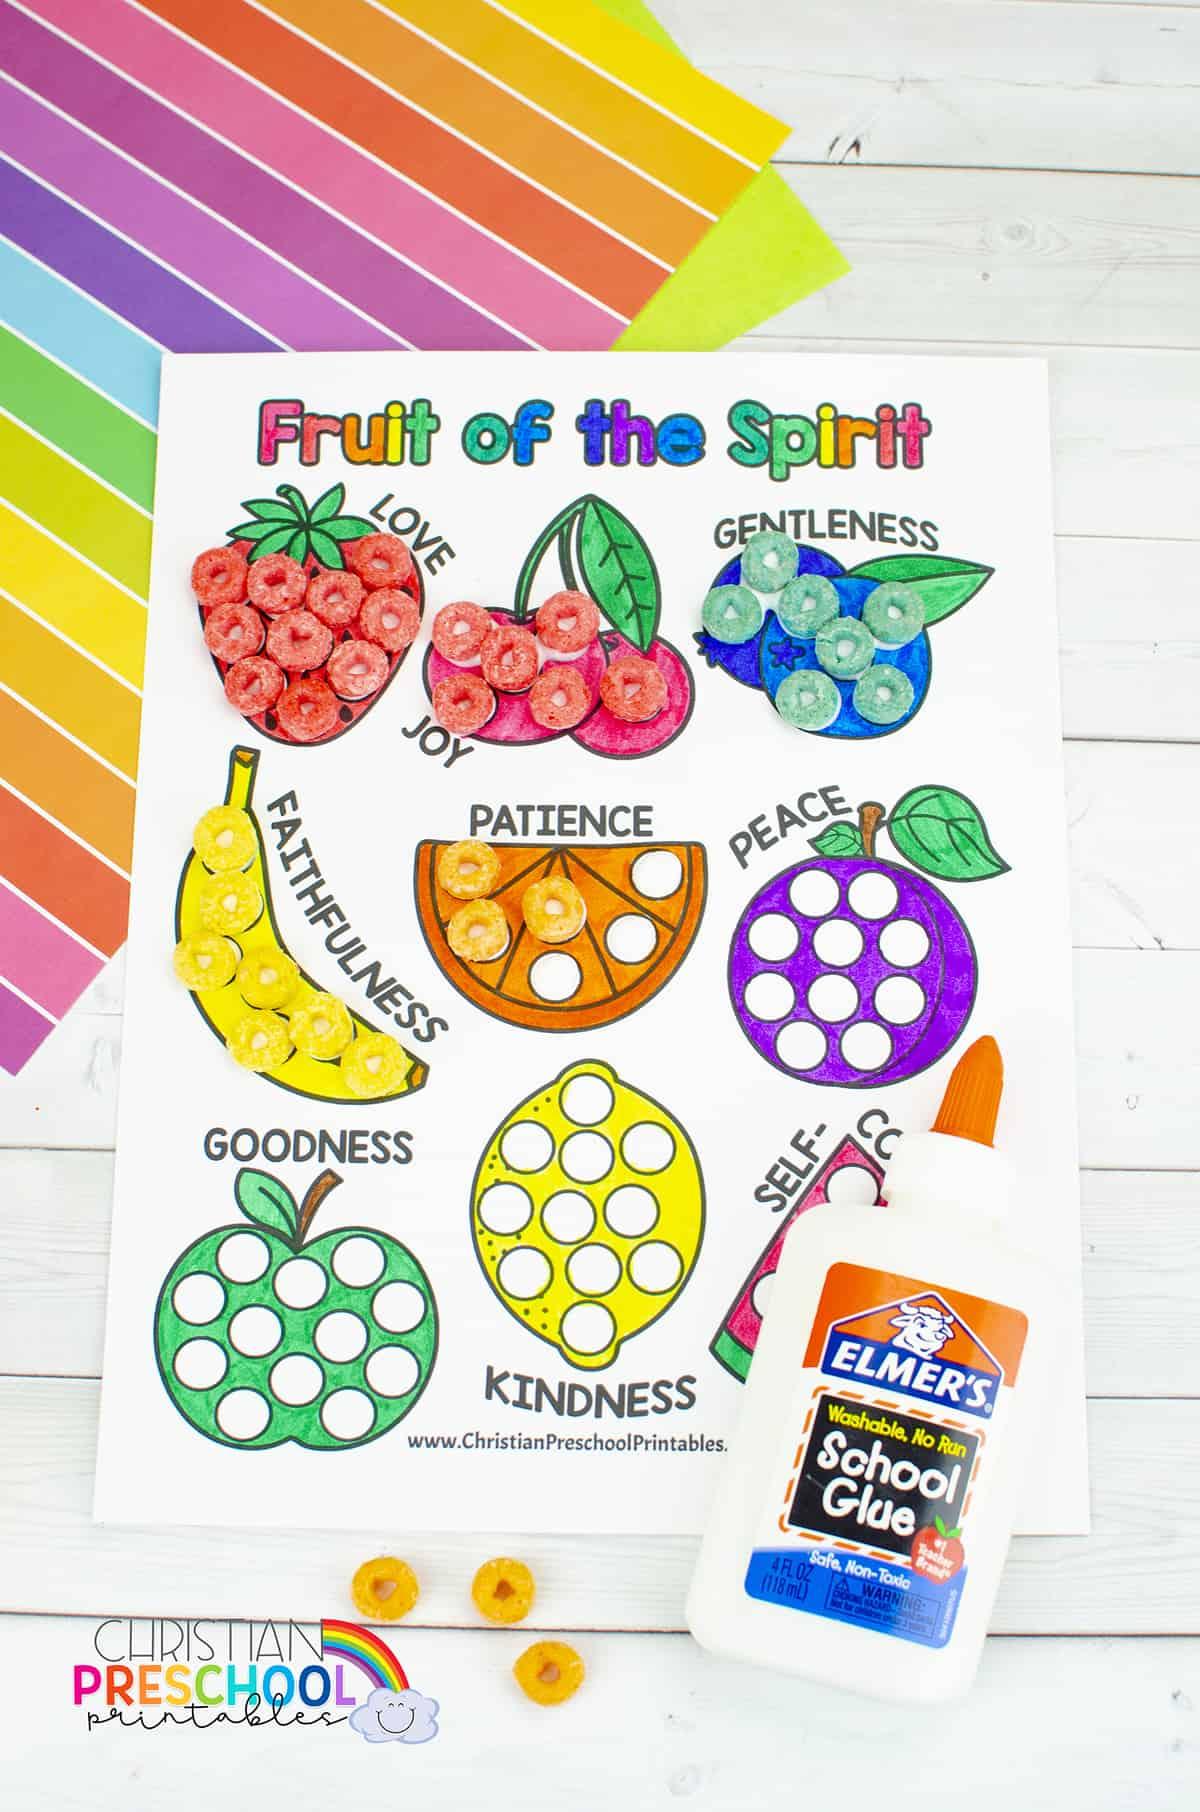 Fruitofthespiritcoloringpageprintables